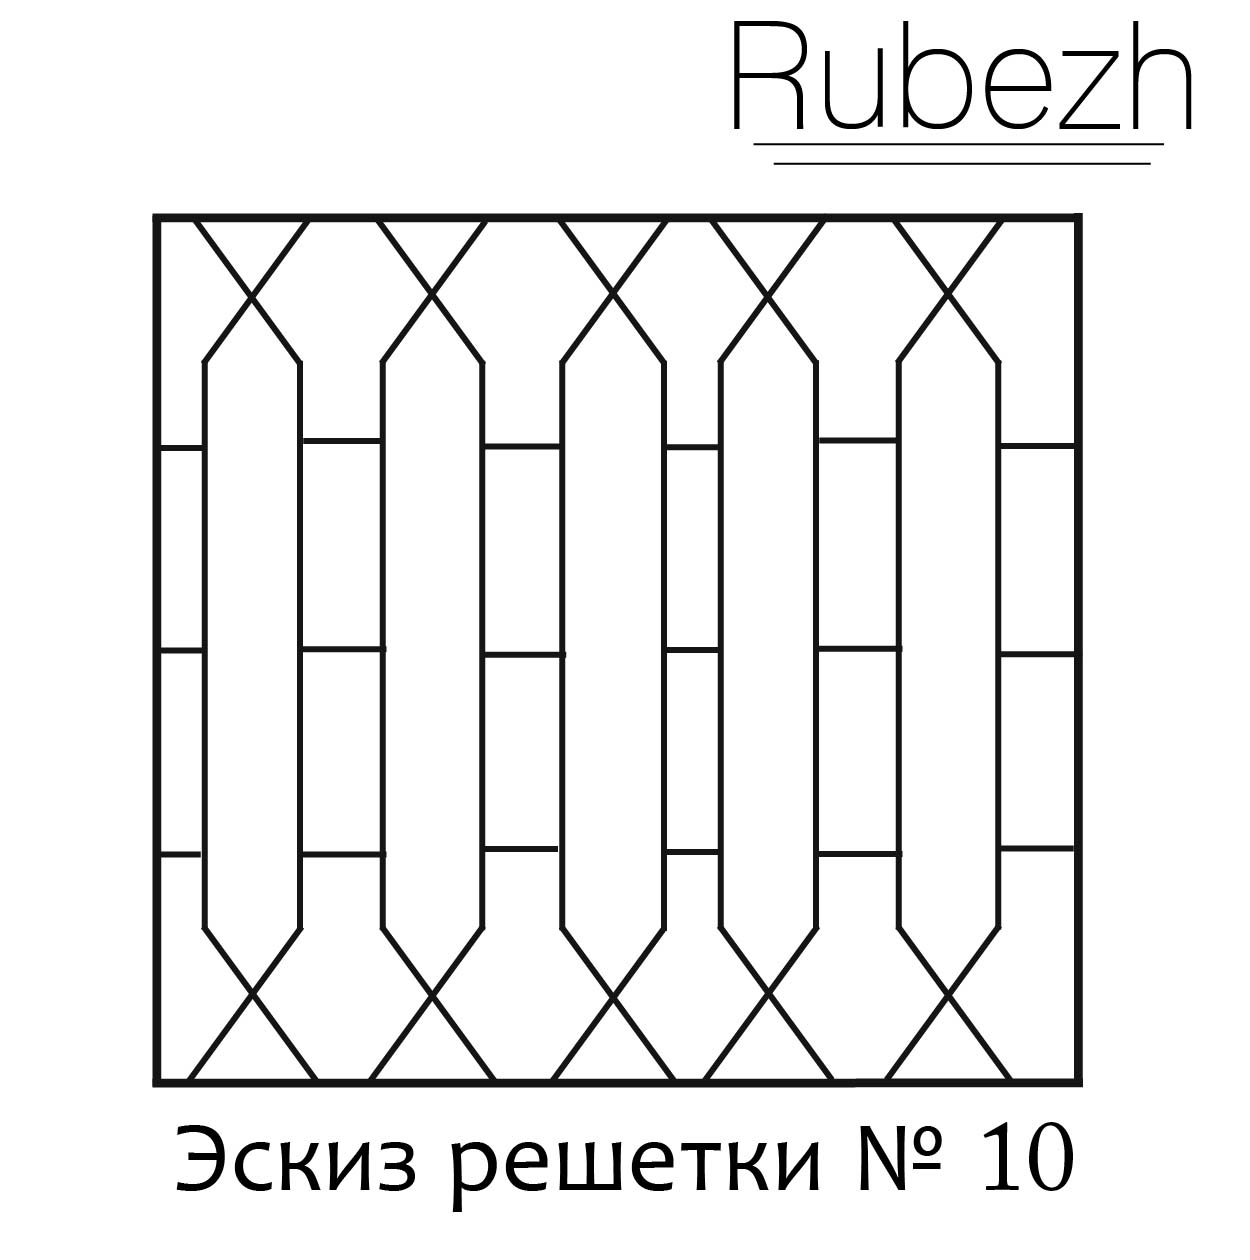 Эскиз решетки № 10